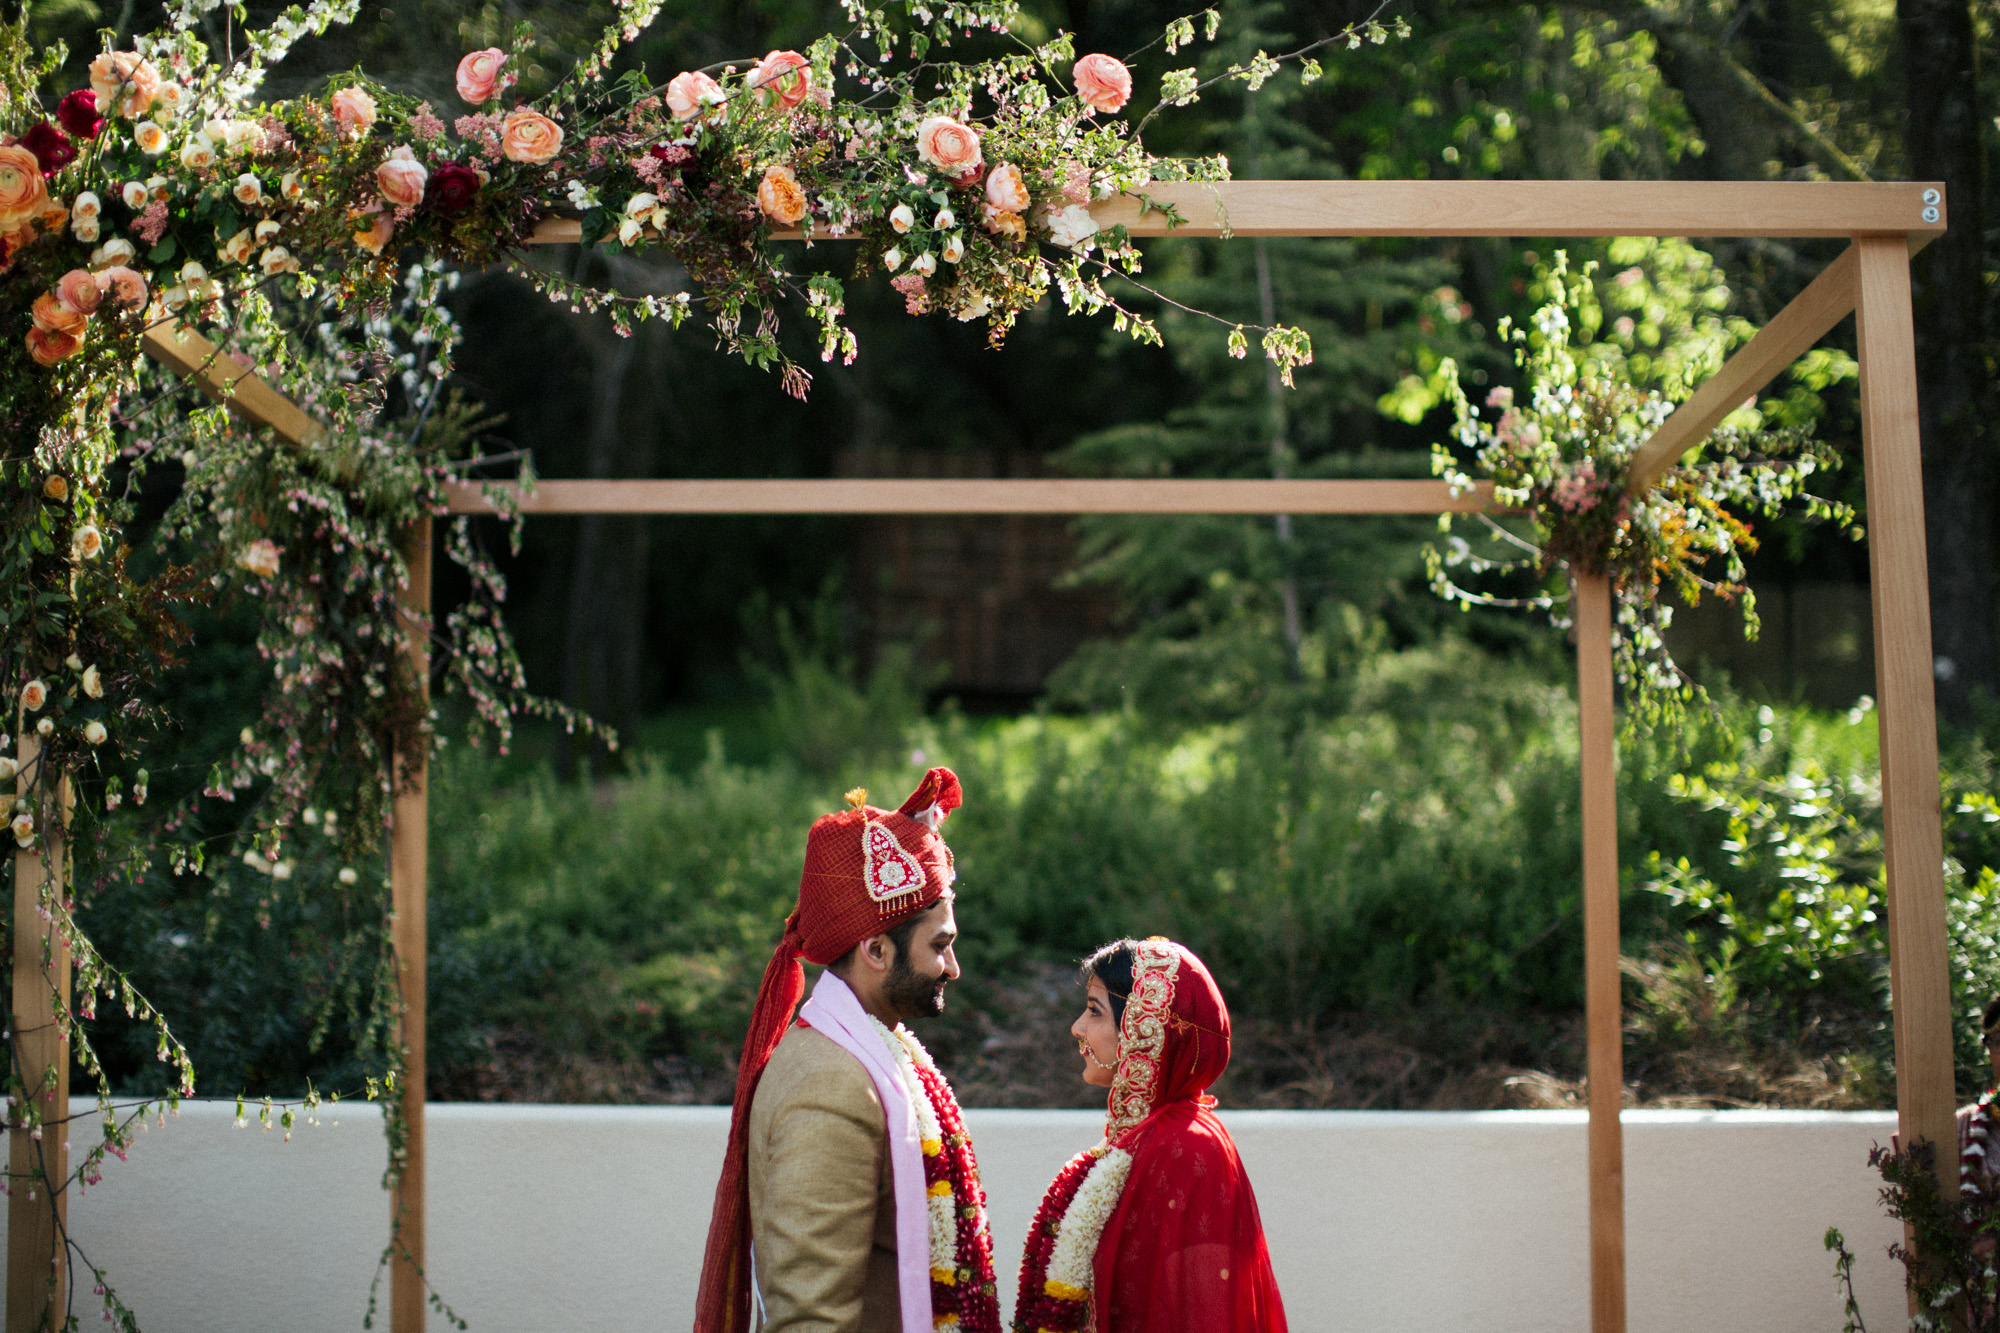 anu_maneesh_alec_vanderboom_Indian_wedding_photography-0116.jpg